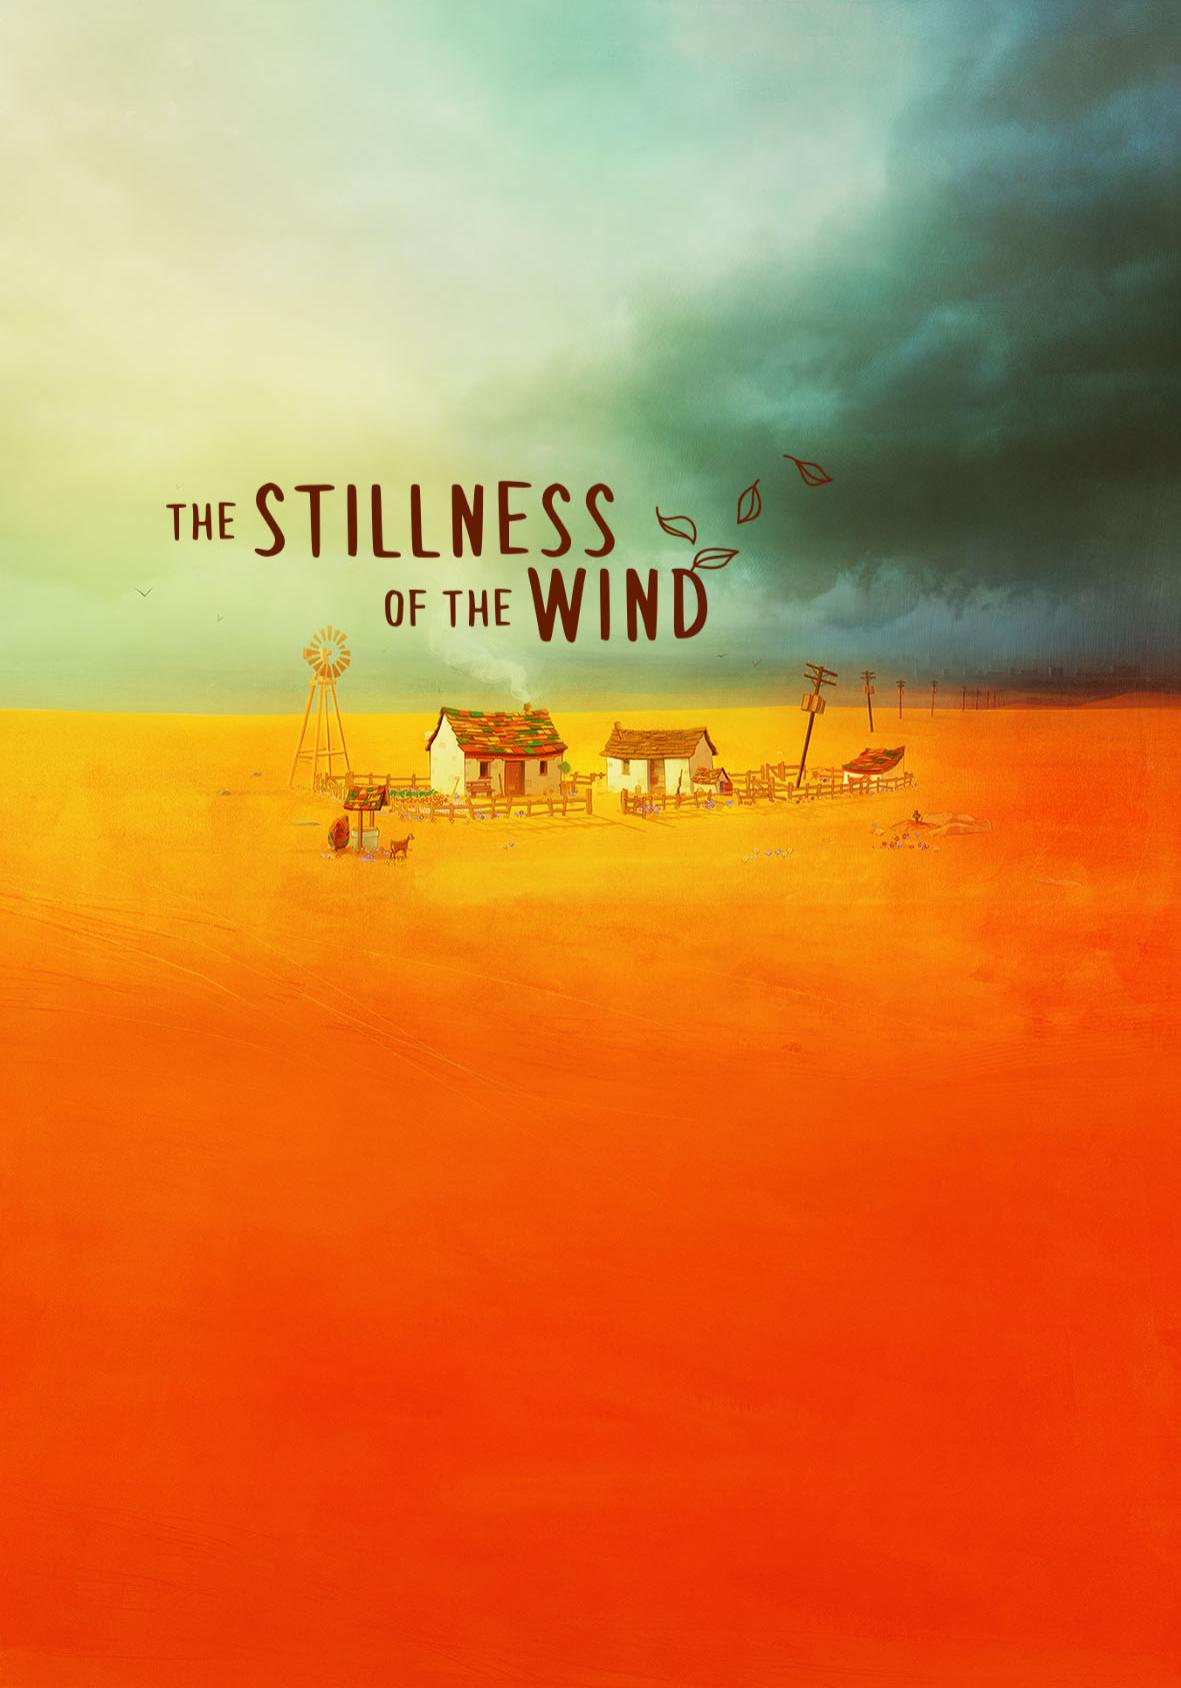 THE STILLNESS OF THE WIND | Lambic Studios